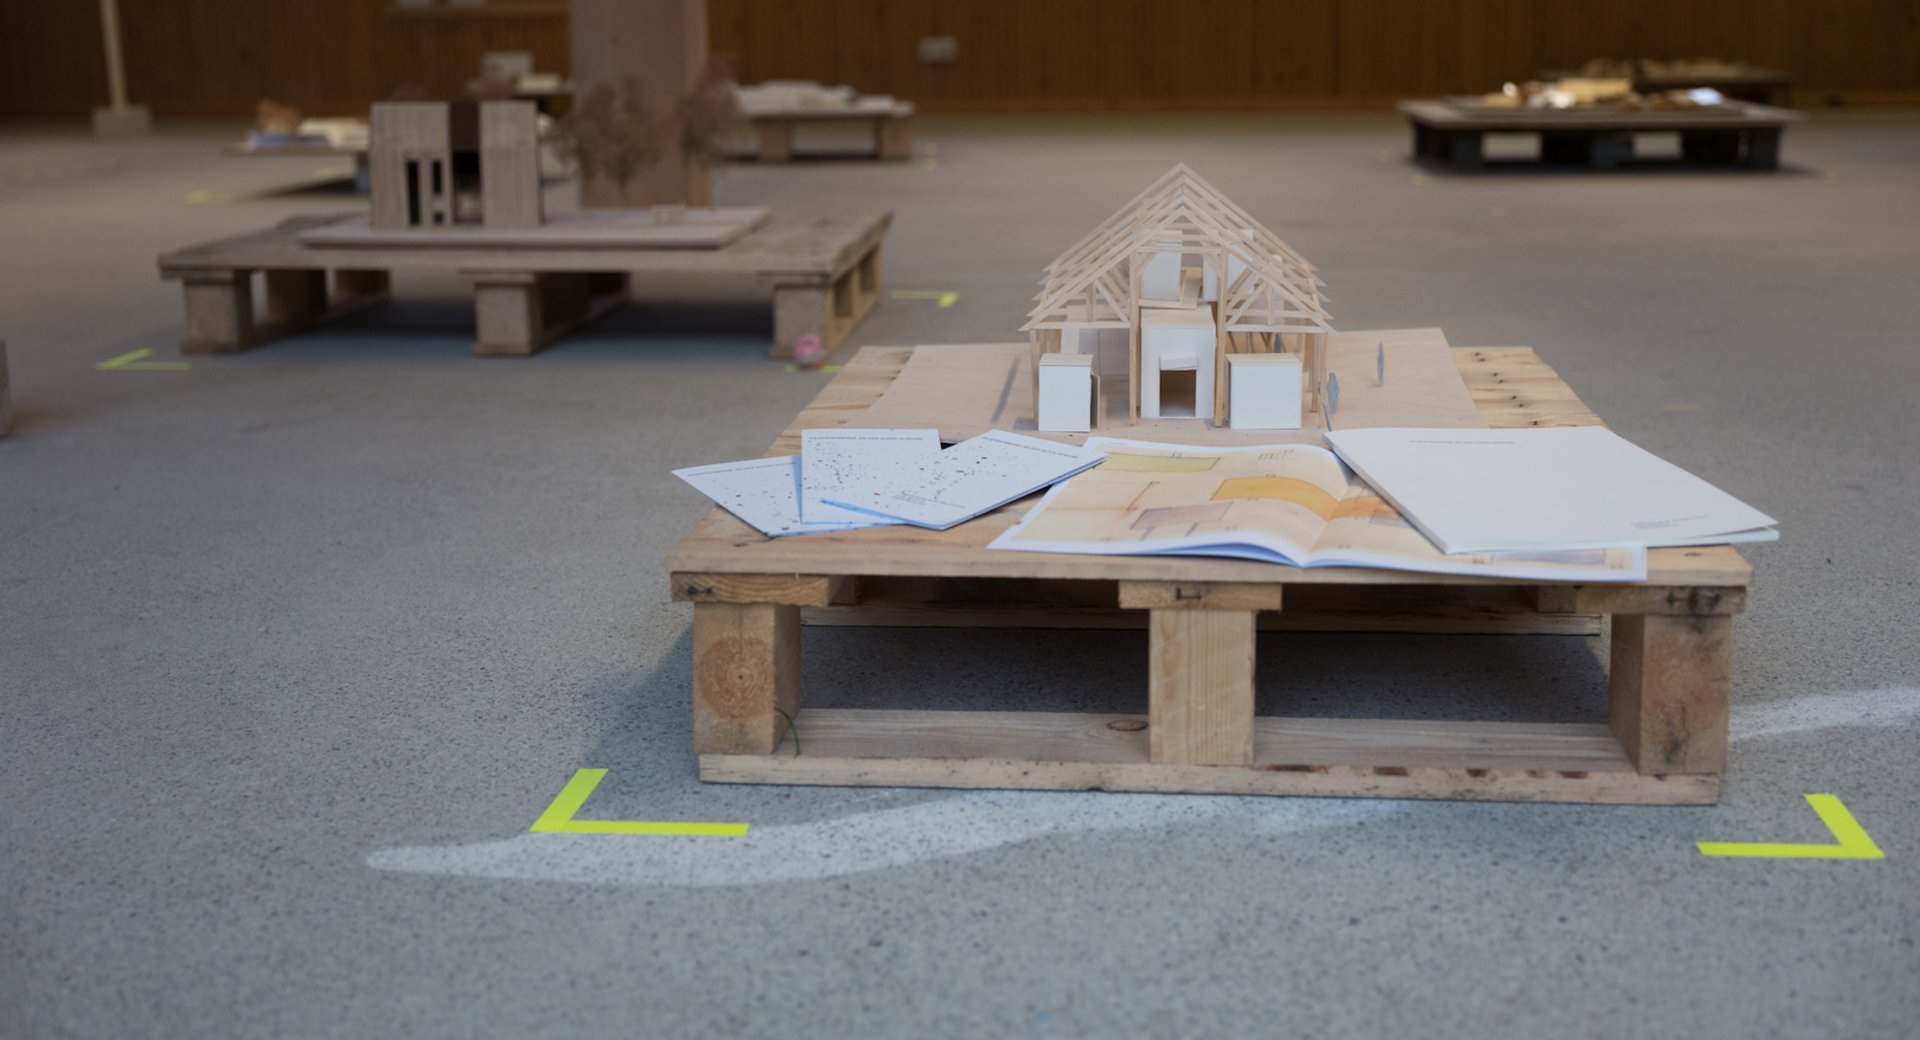 Architekturmodell auf Palette